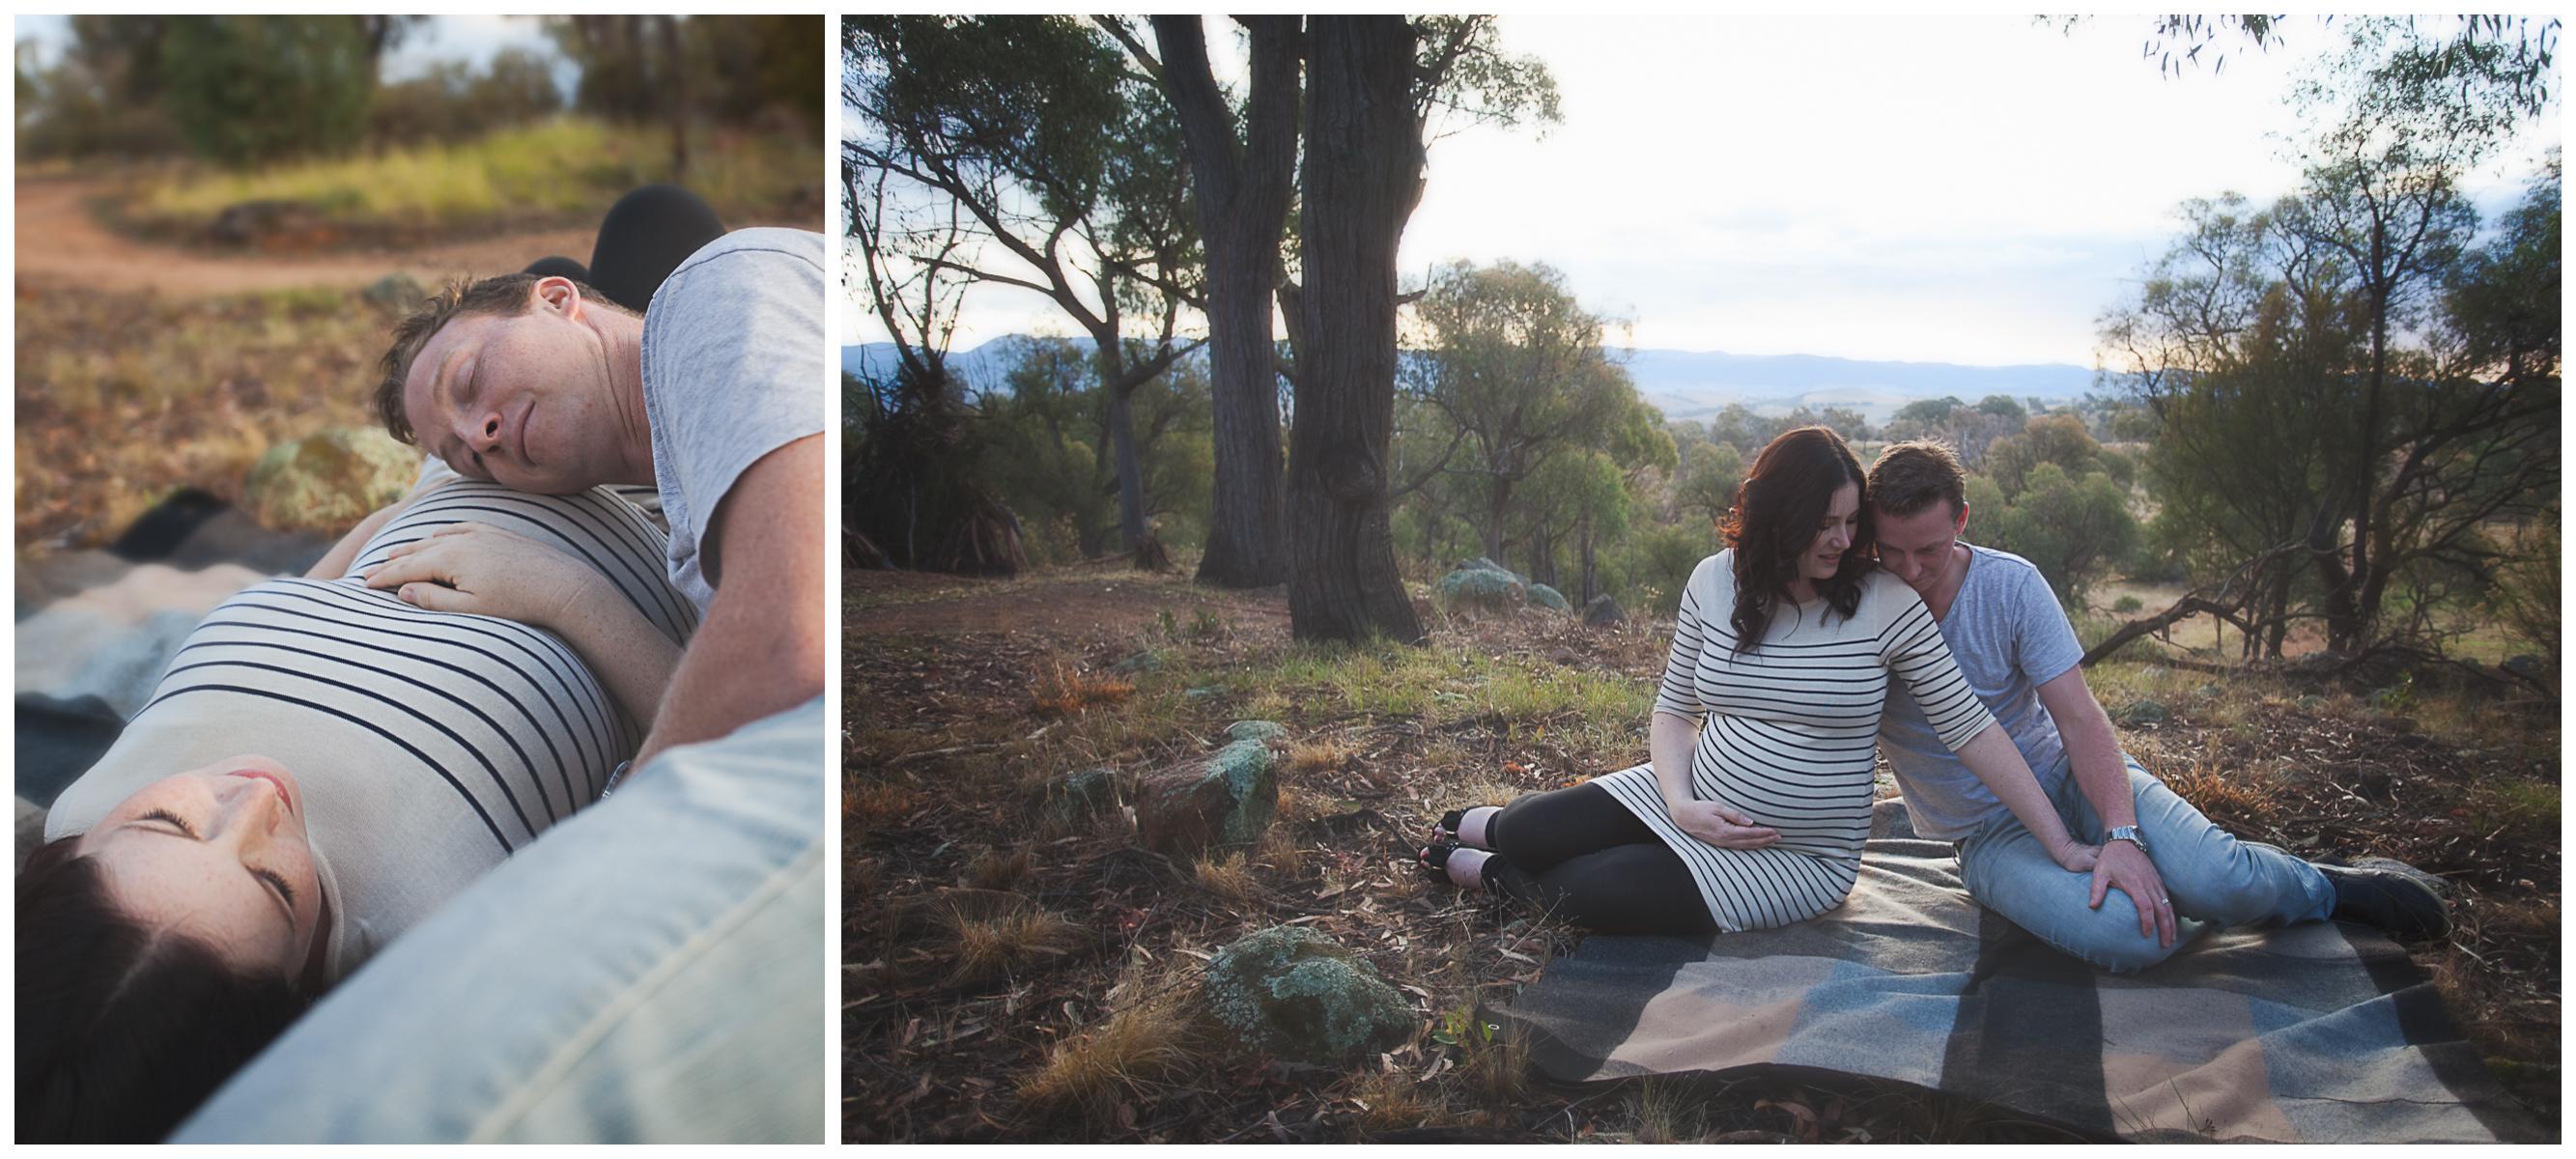 Autumn Session | Maternity